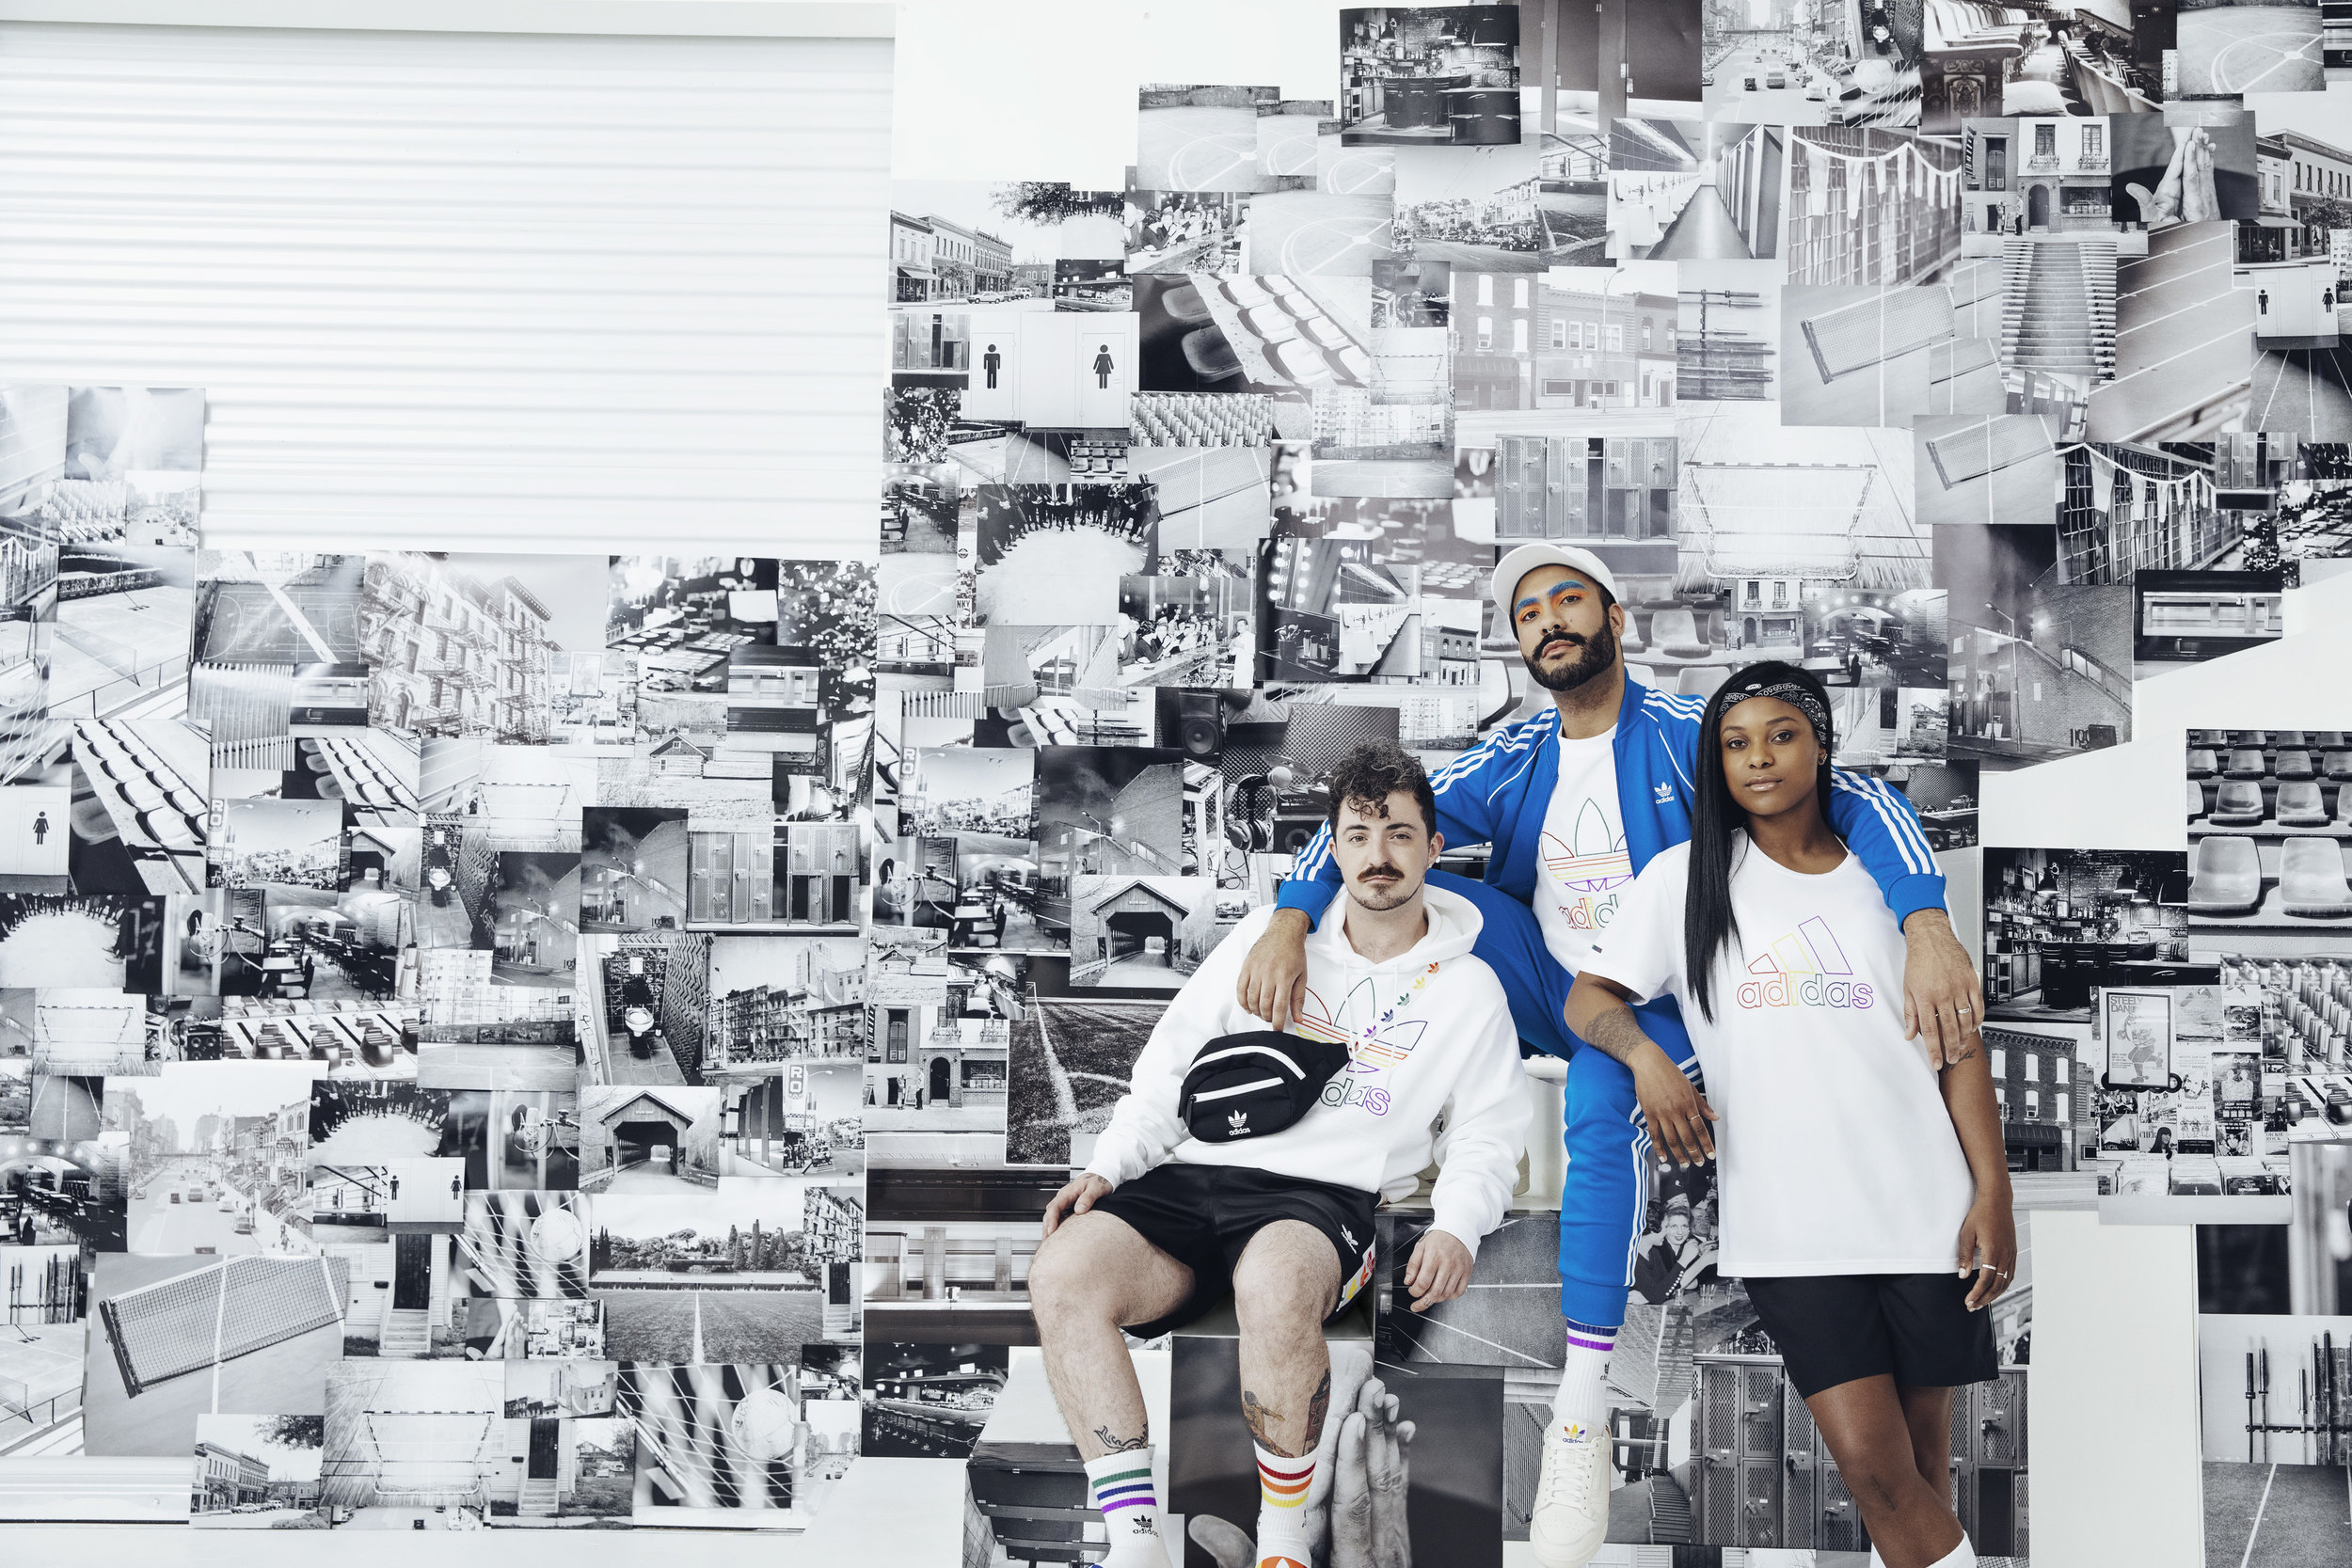 adidas_pride_love_unites_by_gia_goodrich_lesbian_artist_activist_Shot_13_Small_Group_01238.jpg